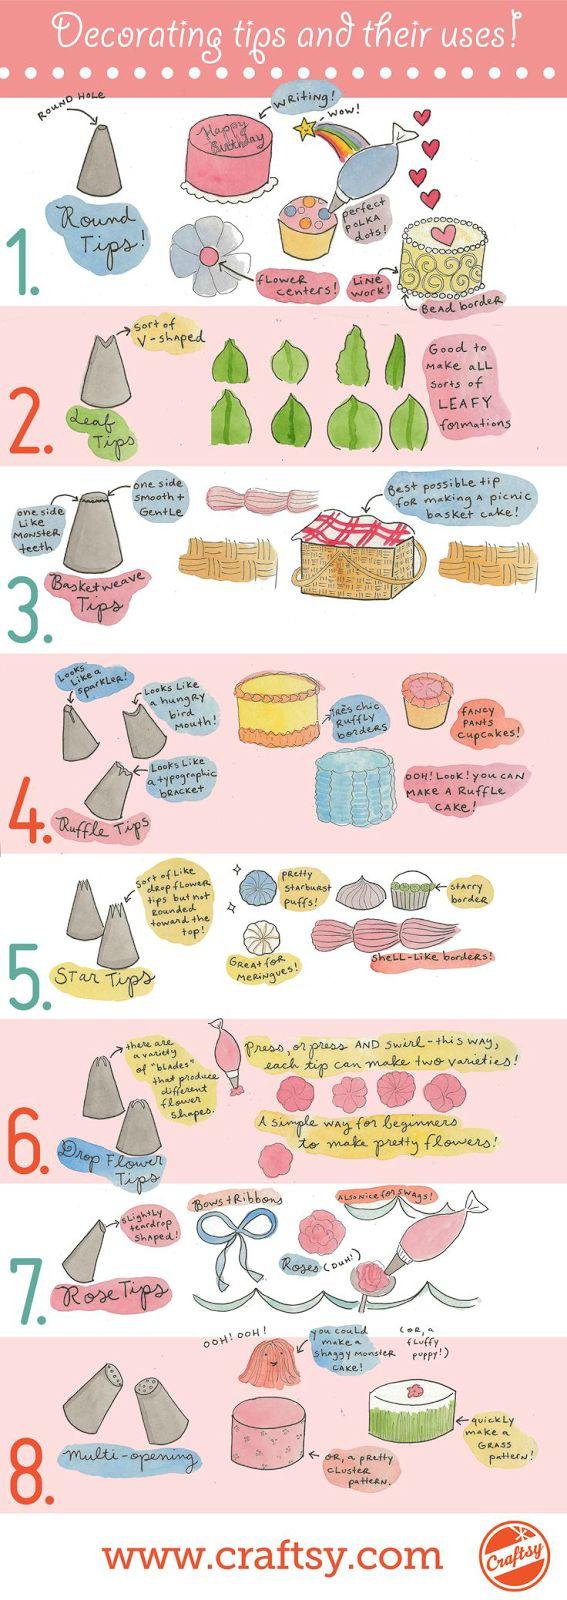 Decoracion Con Baño Wilton:Cake Decorating Tips and Their Uses